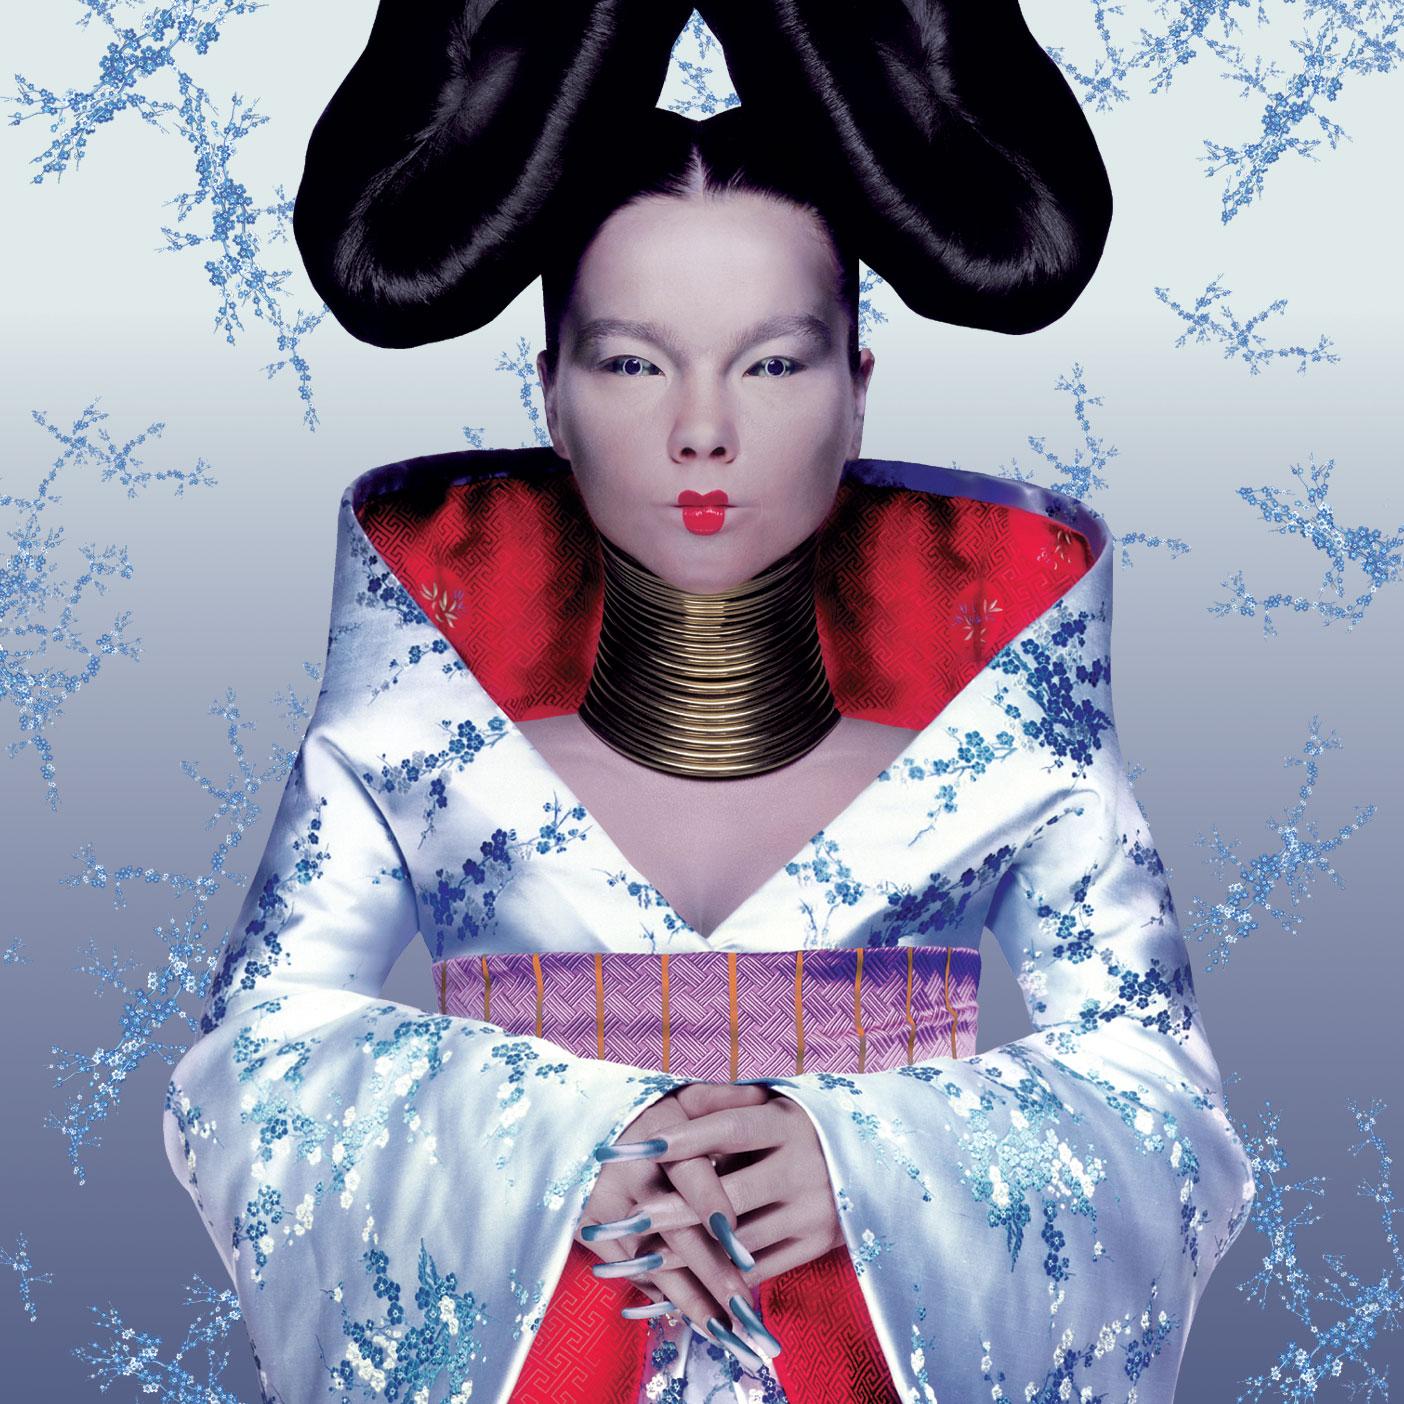 http://3.bp.blogspot.com/-bJ0JNaqonL0/TrgLm_uEsSI/AAAAAAAAAuA/-K6XpqrIwaY/s1600/bjork_-_homogenic_album_cover.jpg